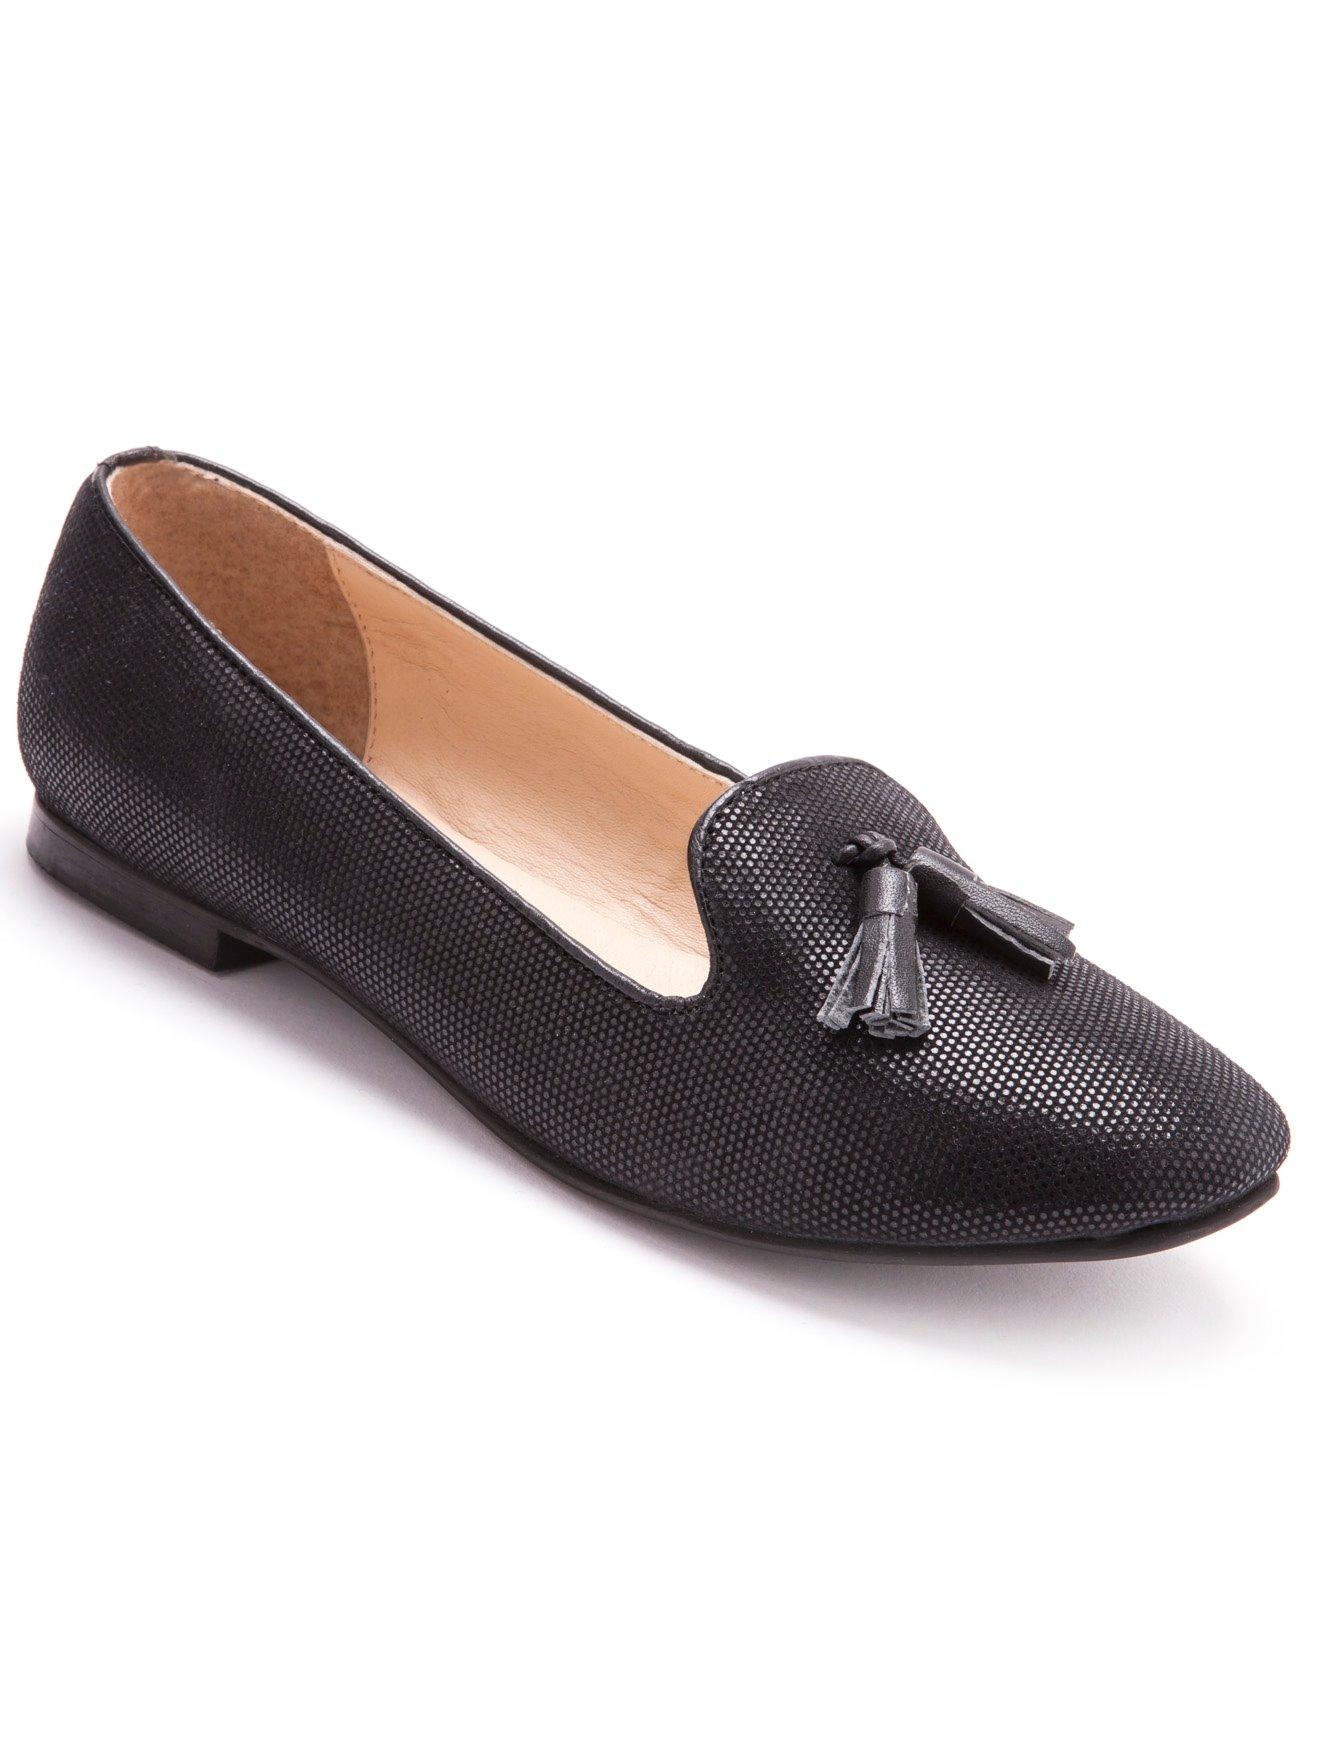 0c208c3d2827f SOLDES Slippers, mocassin femme, chaussure plate, ballerines, ballerines  femme